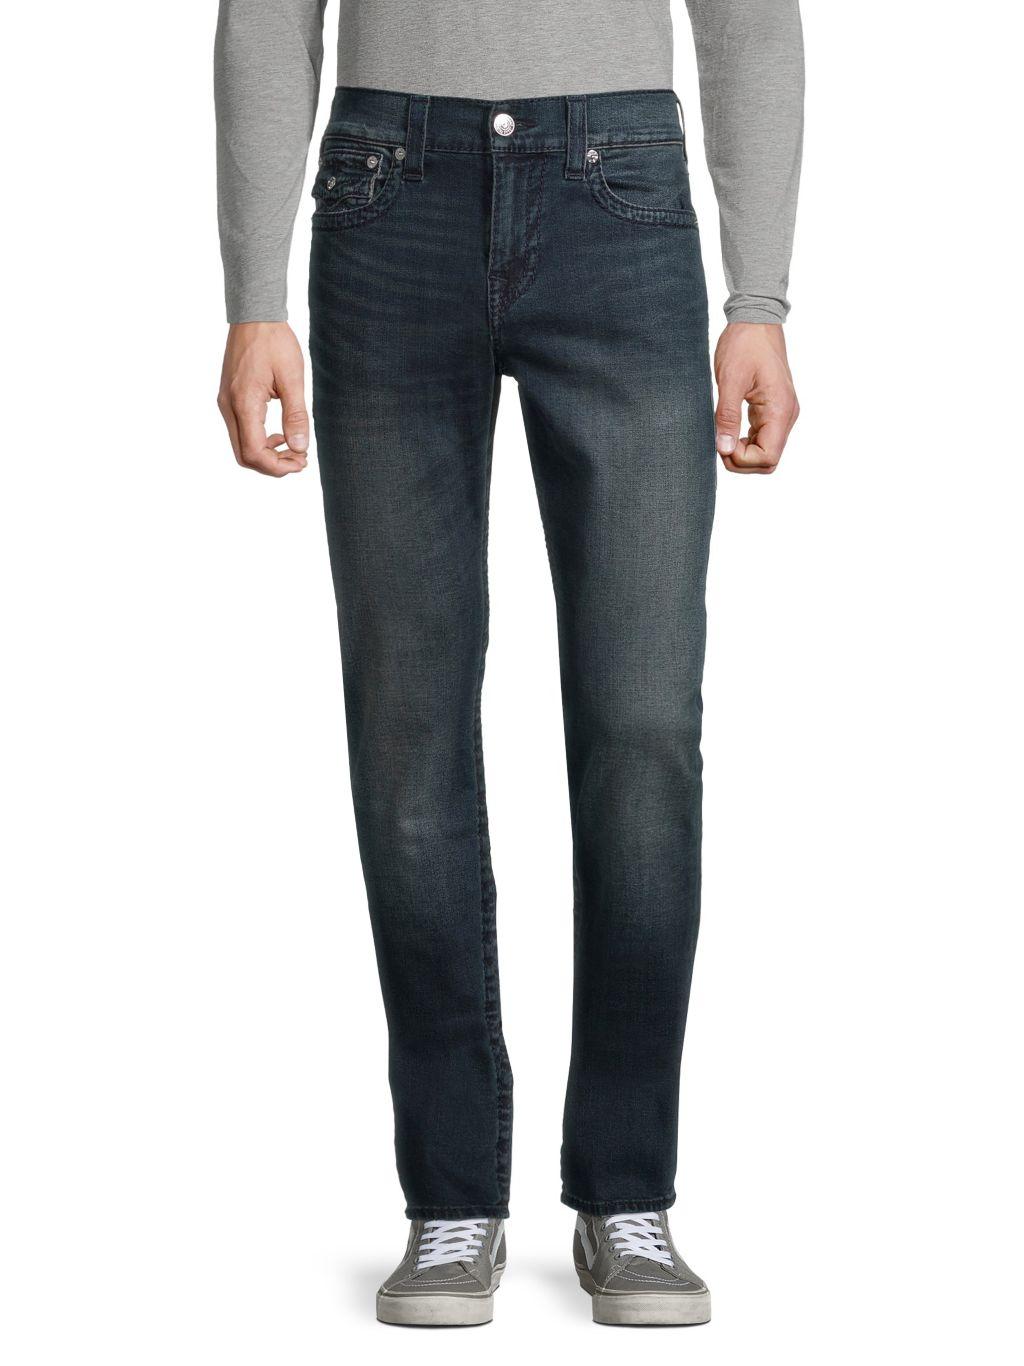 True Religion Geno Slim-Fit Jeans